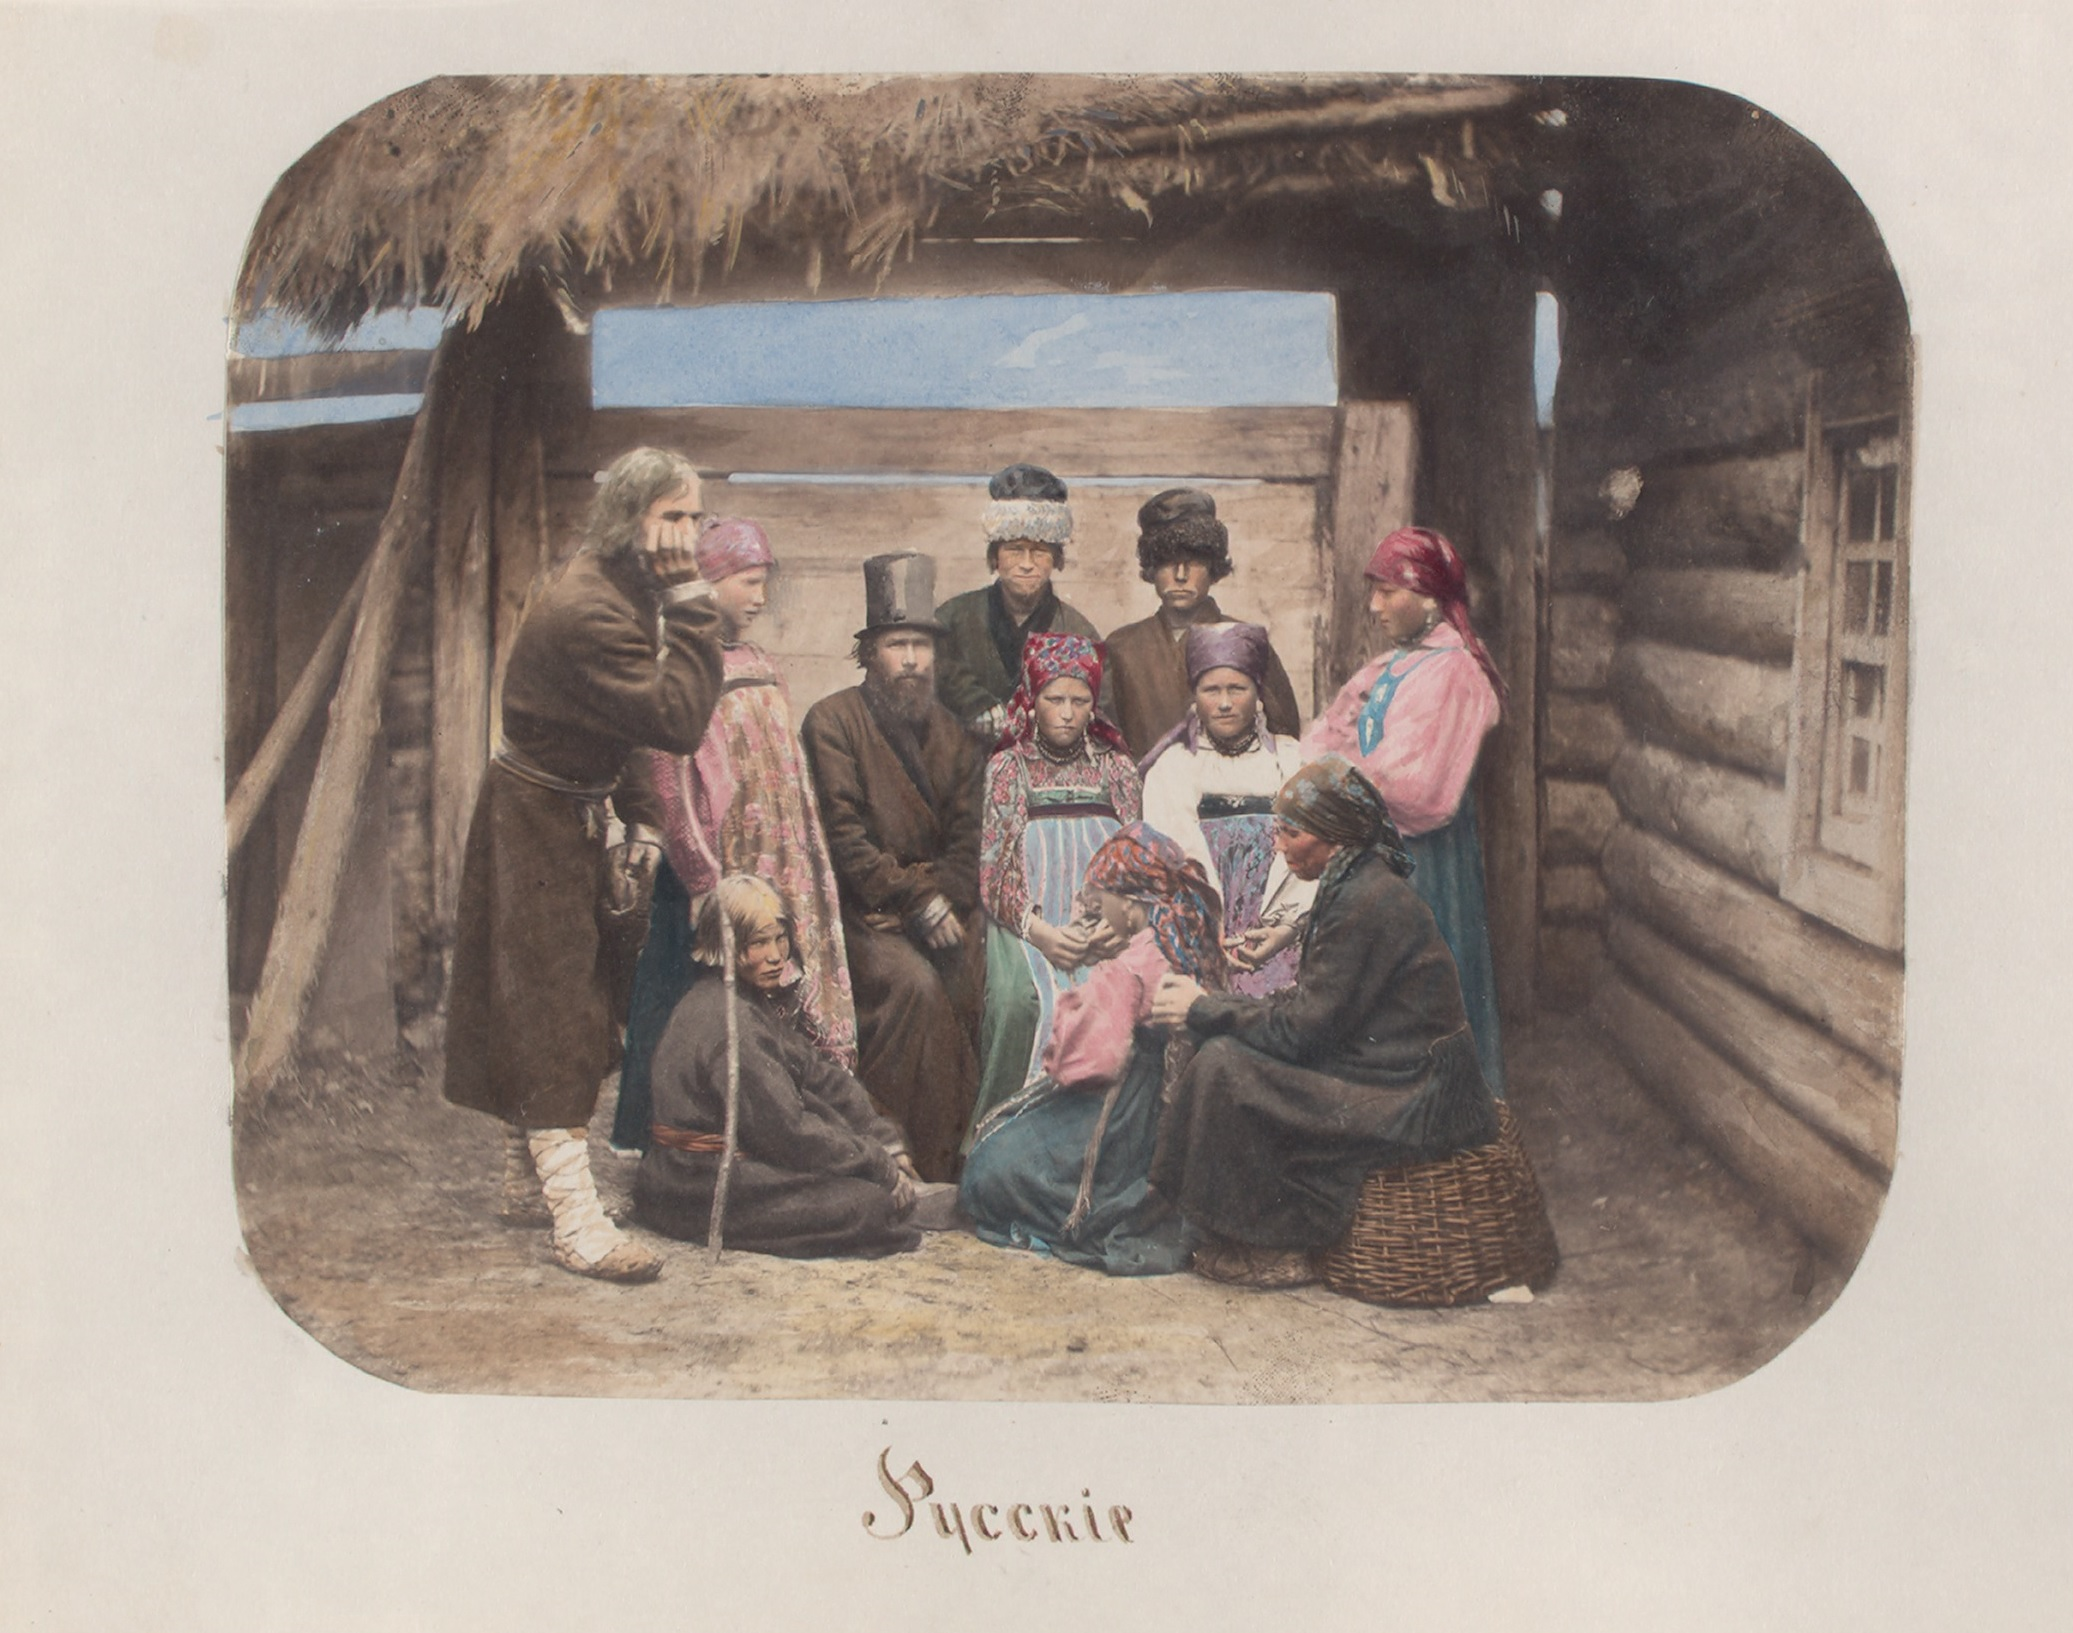 Bevölkerung Pensa Russland 1862 NYPL 7